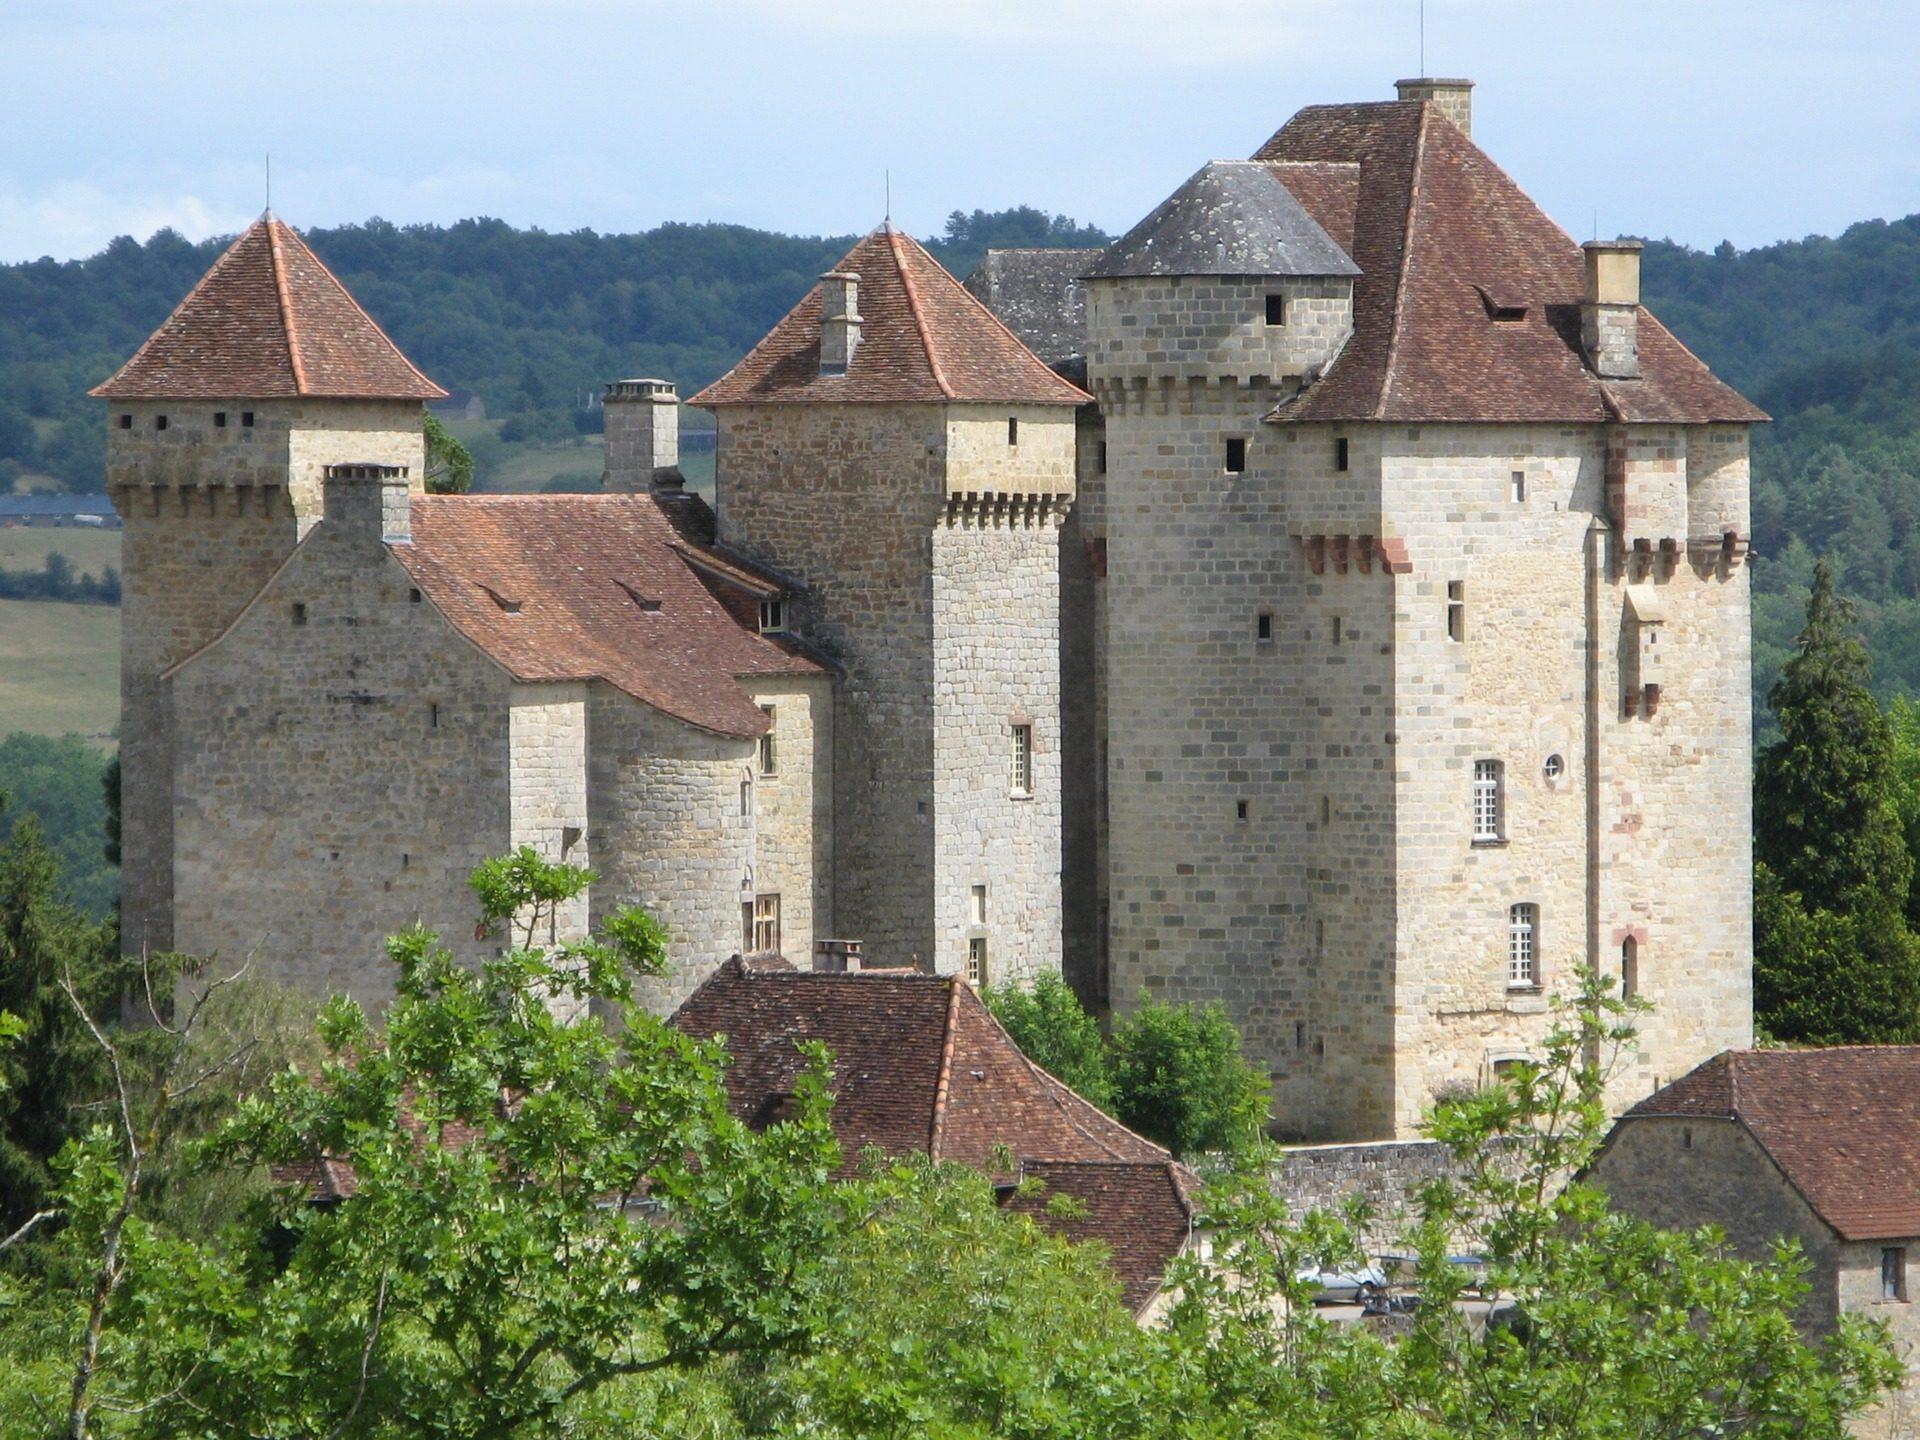 Castello, Edificación, Fortezza, Torres, Francia - Sfondi HD - Professor-falken.com